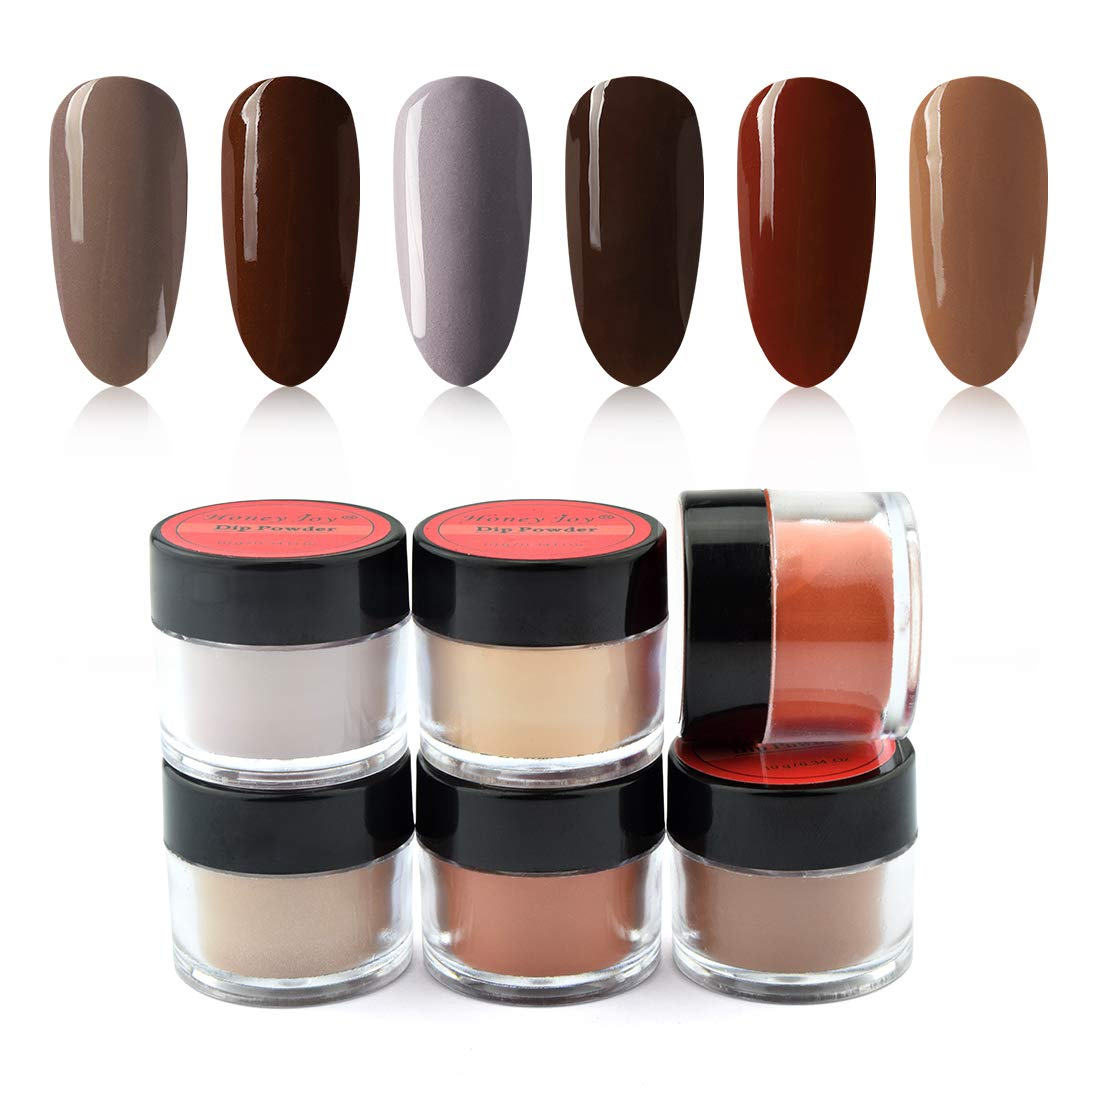 6 Box/Set Fine Dipping Powder Dark Brown Coffee Grey Colors No Need Lamp Cure Dip Powder Nails,Like Gel Polish Effect, Even & Smooth Finishing (12-18-96-143-144-145-10g/box)